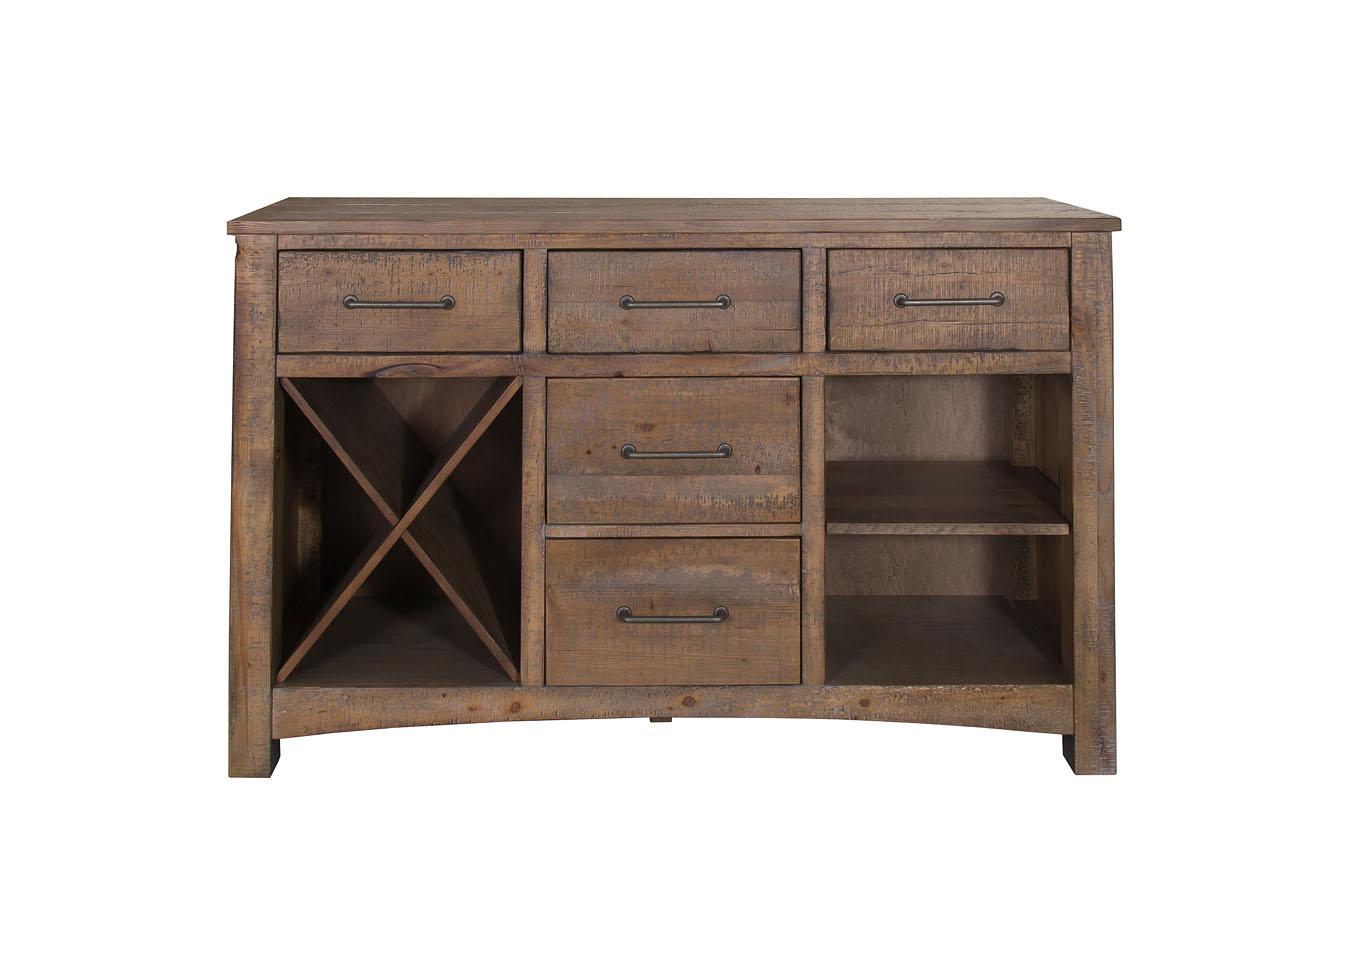 trellis offices toggle doni furniture item portfolio task nulook office workup